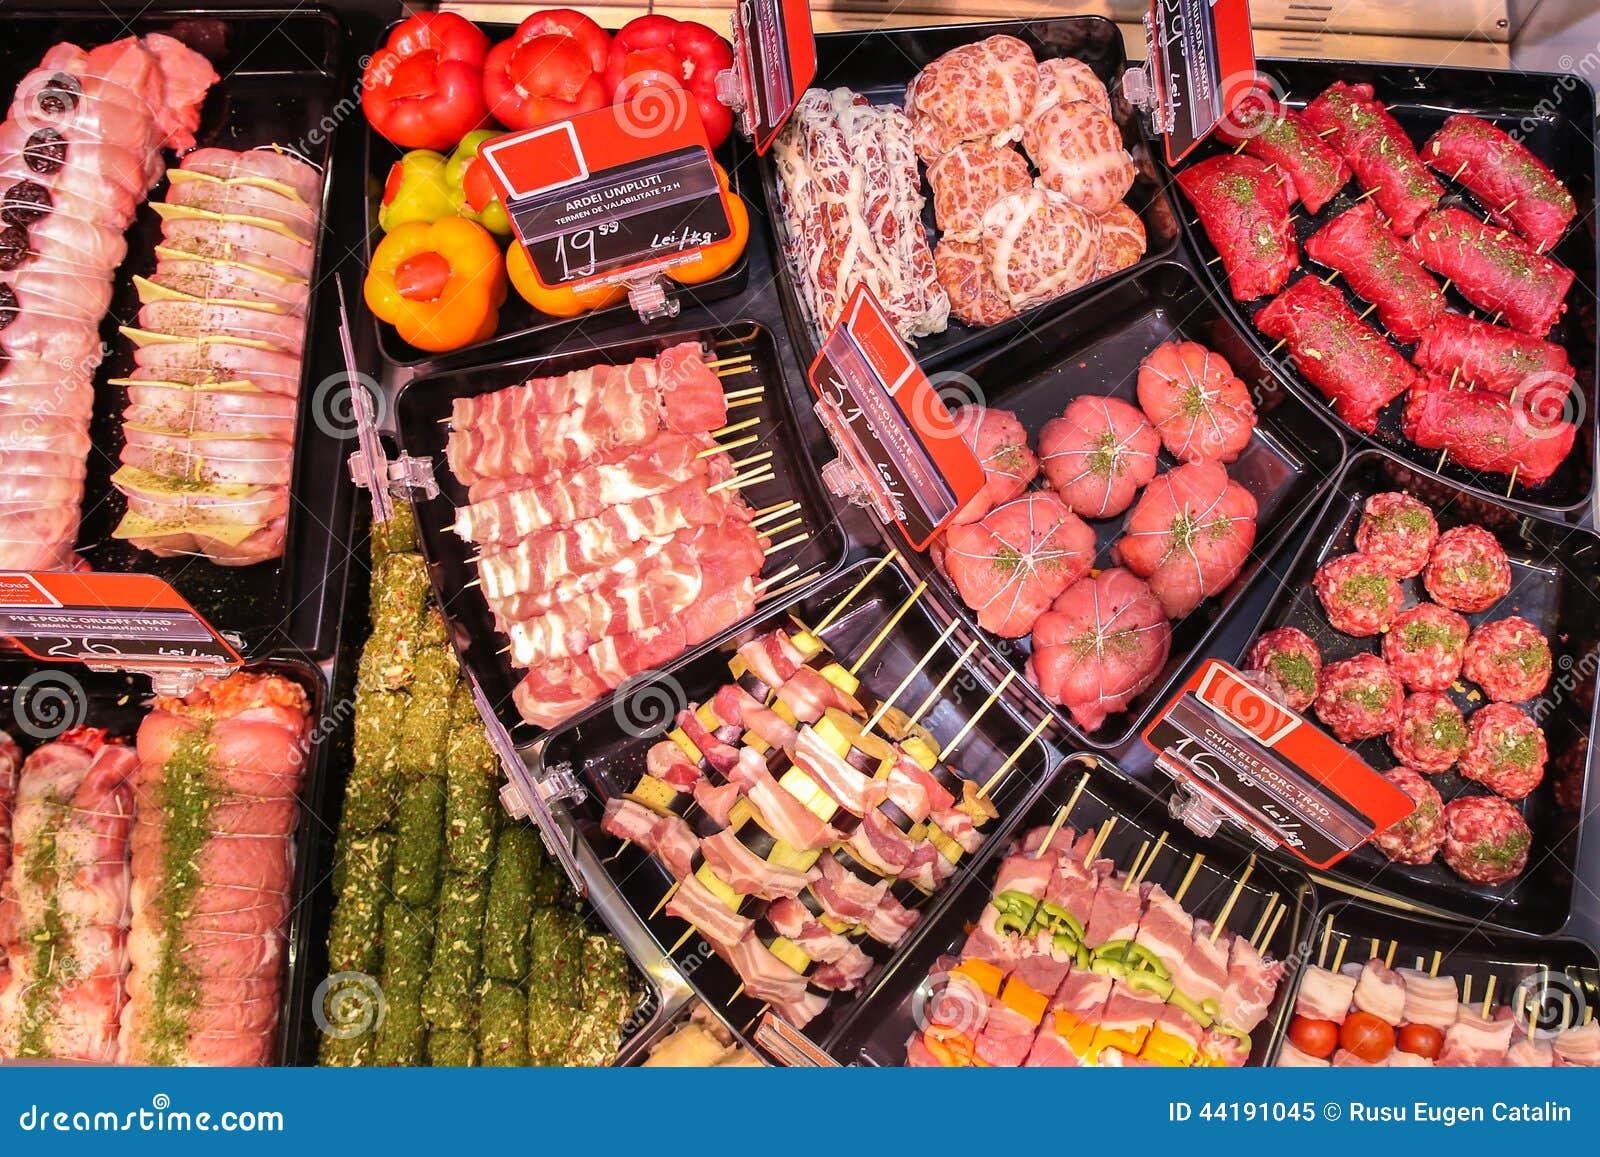 Viande pour le barbecue photo stock image 44191045 for Quelle viande pour un barbecue